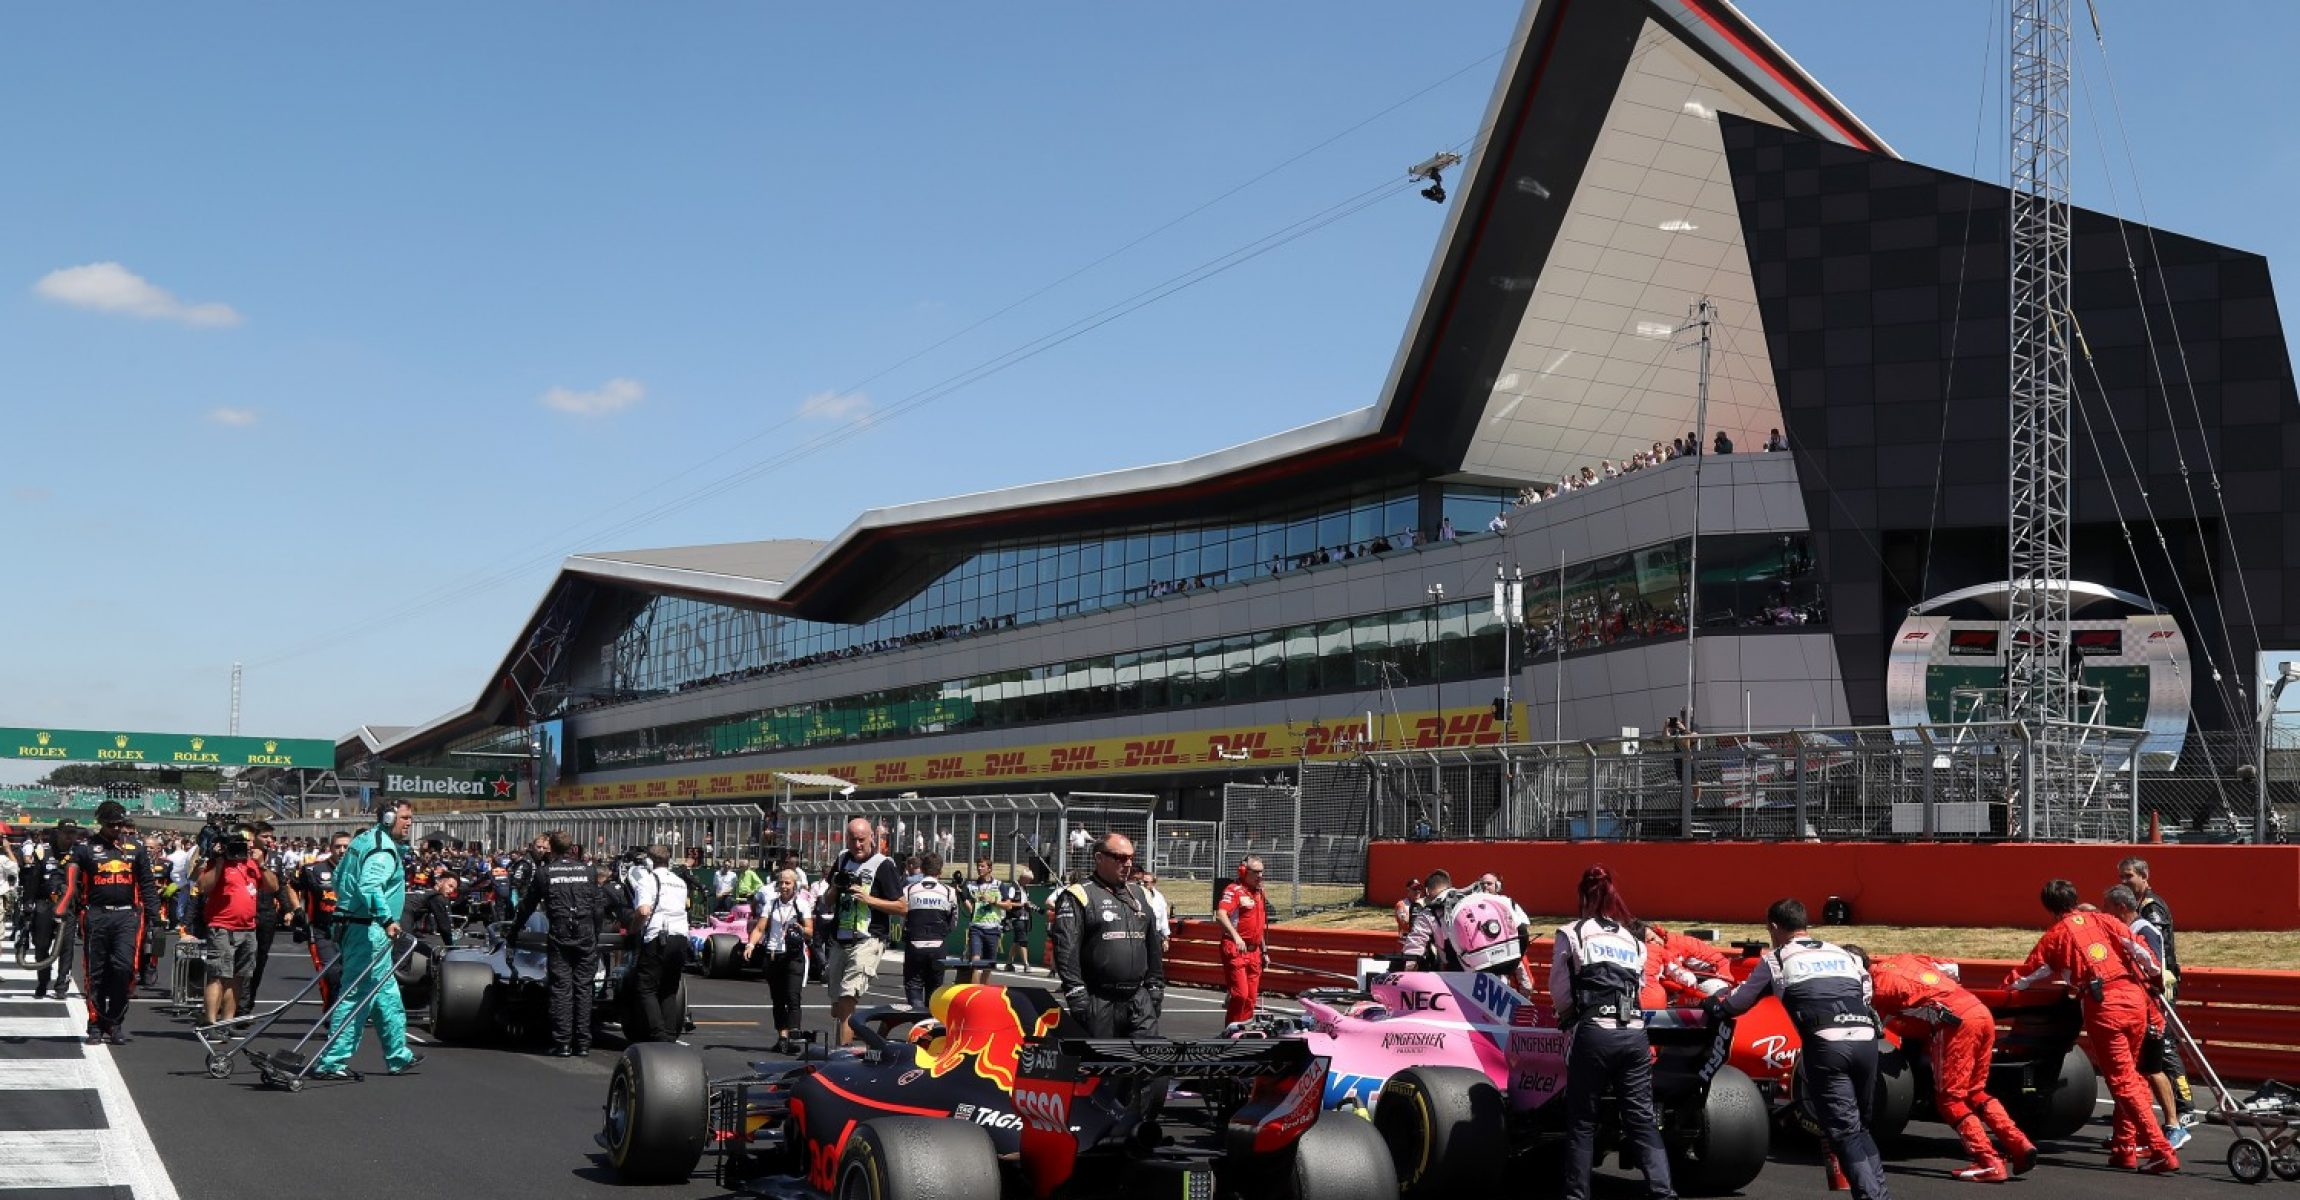 RACE, Silverstone, cars on grid